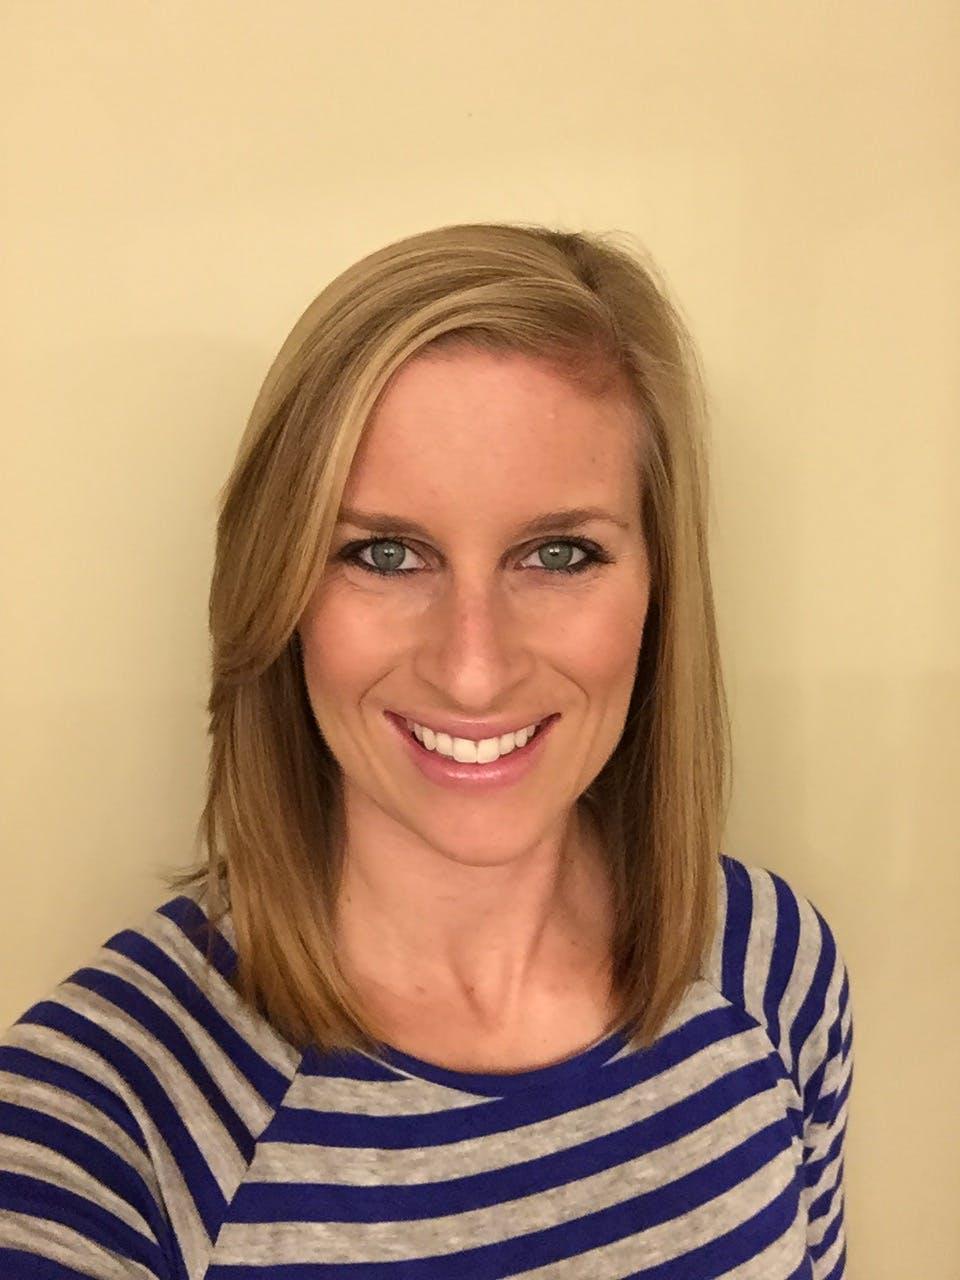 Danielle Boxberger